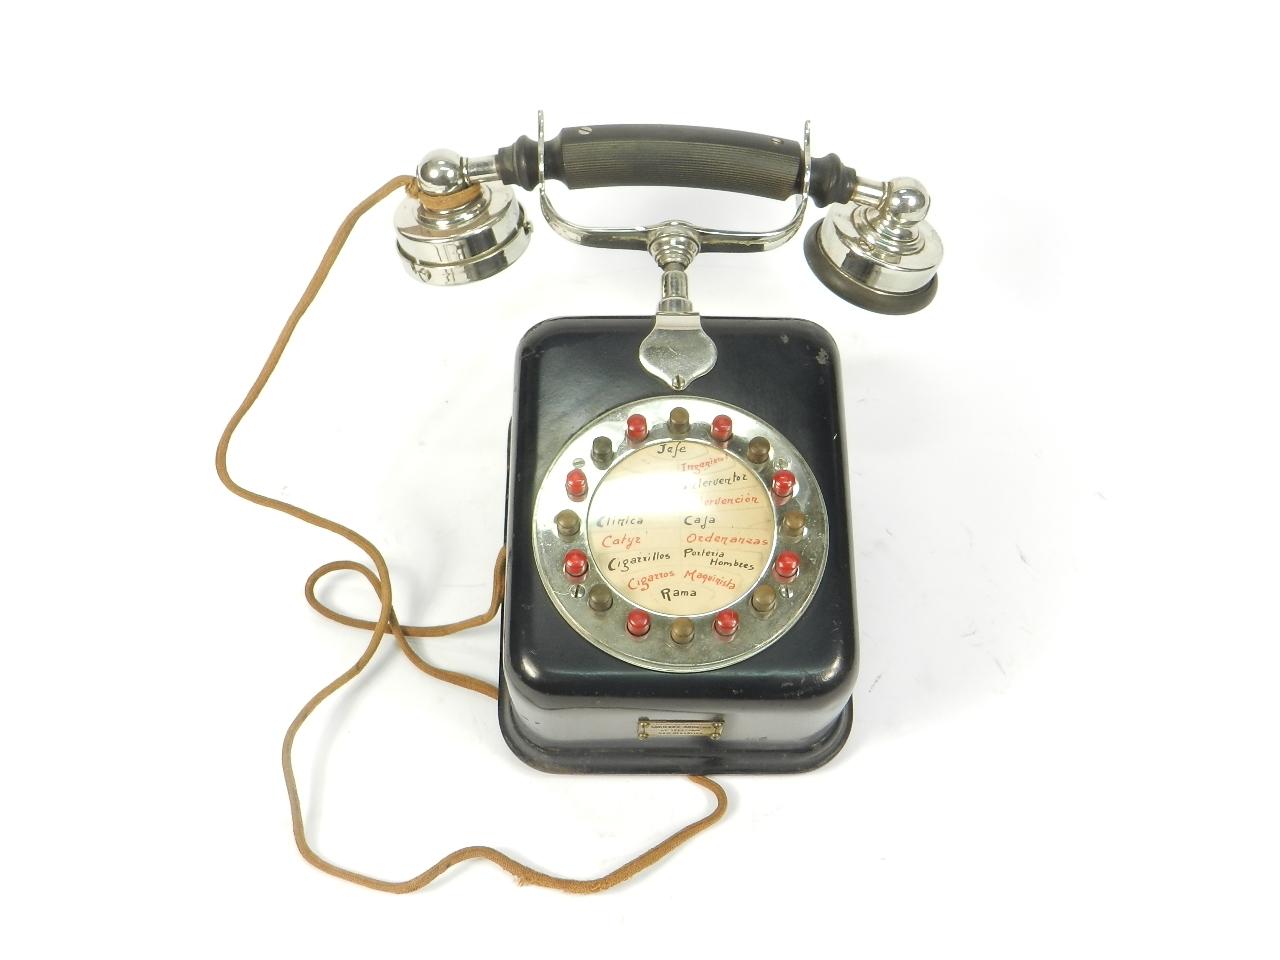 Imagen S.A. DE TELEFONÍA SAN SEBASTIAN AÑO 1940 41784